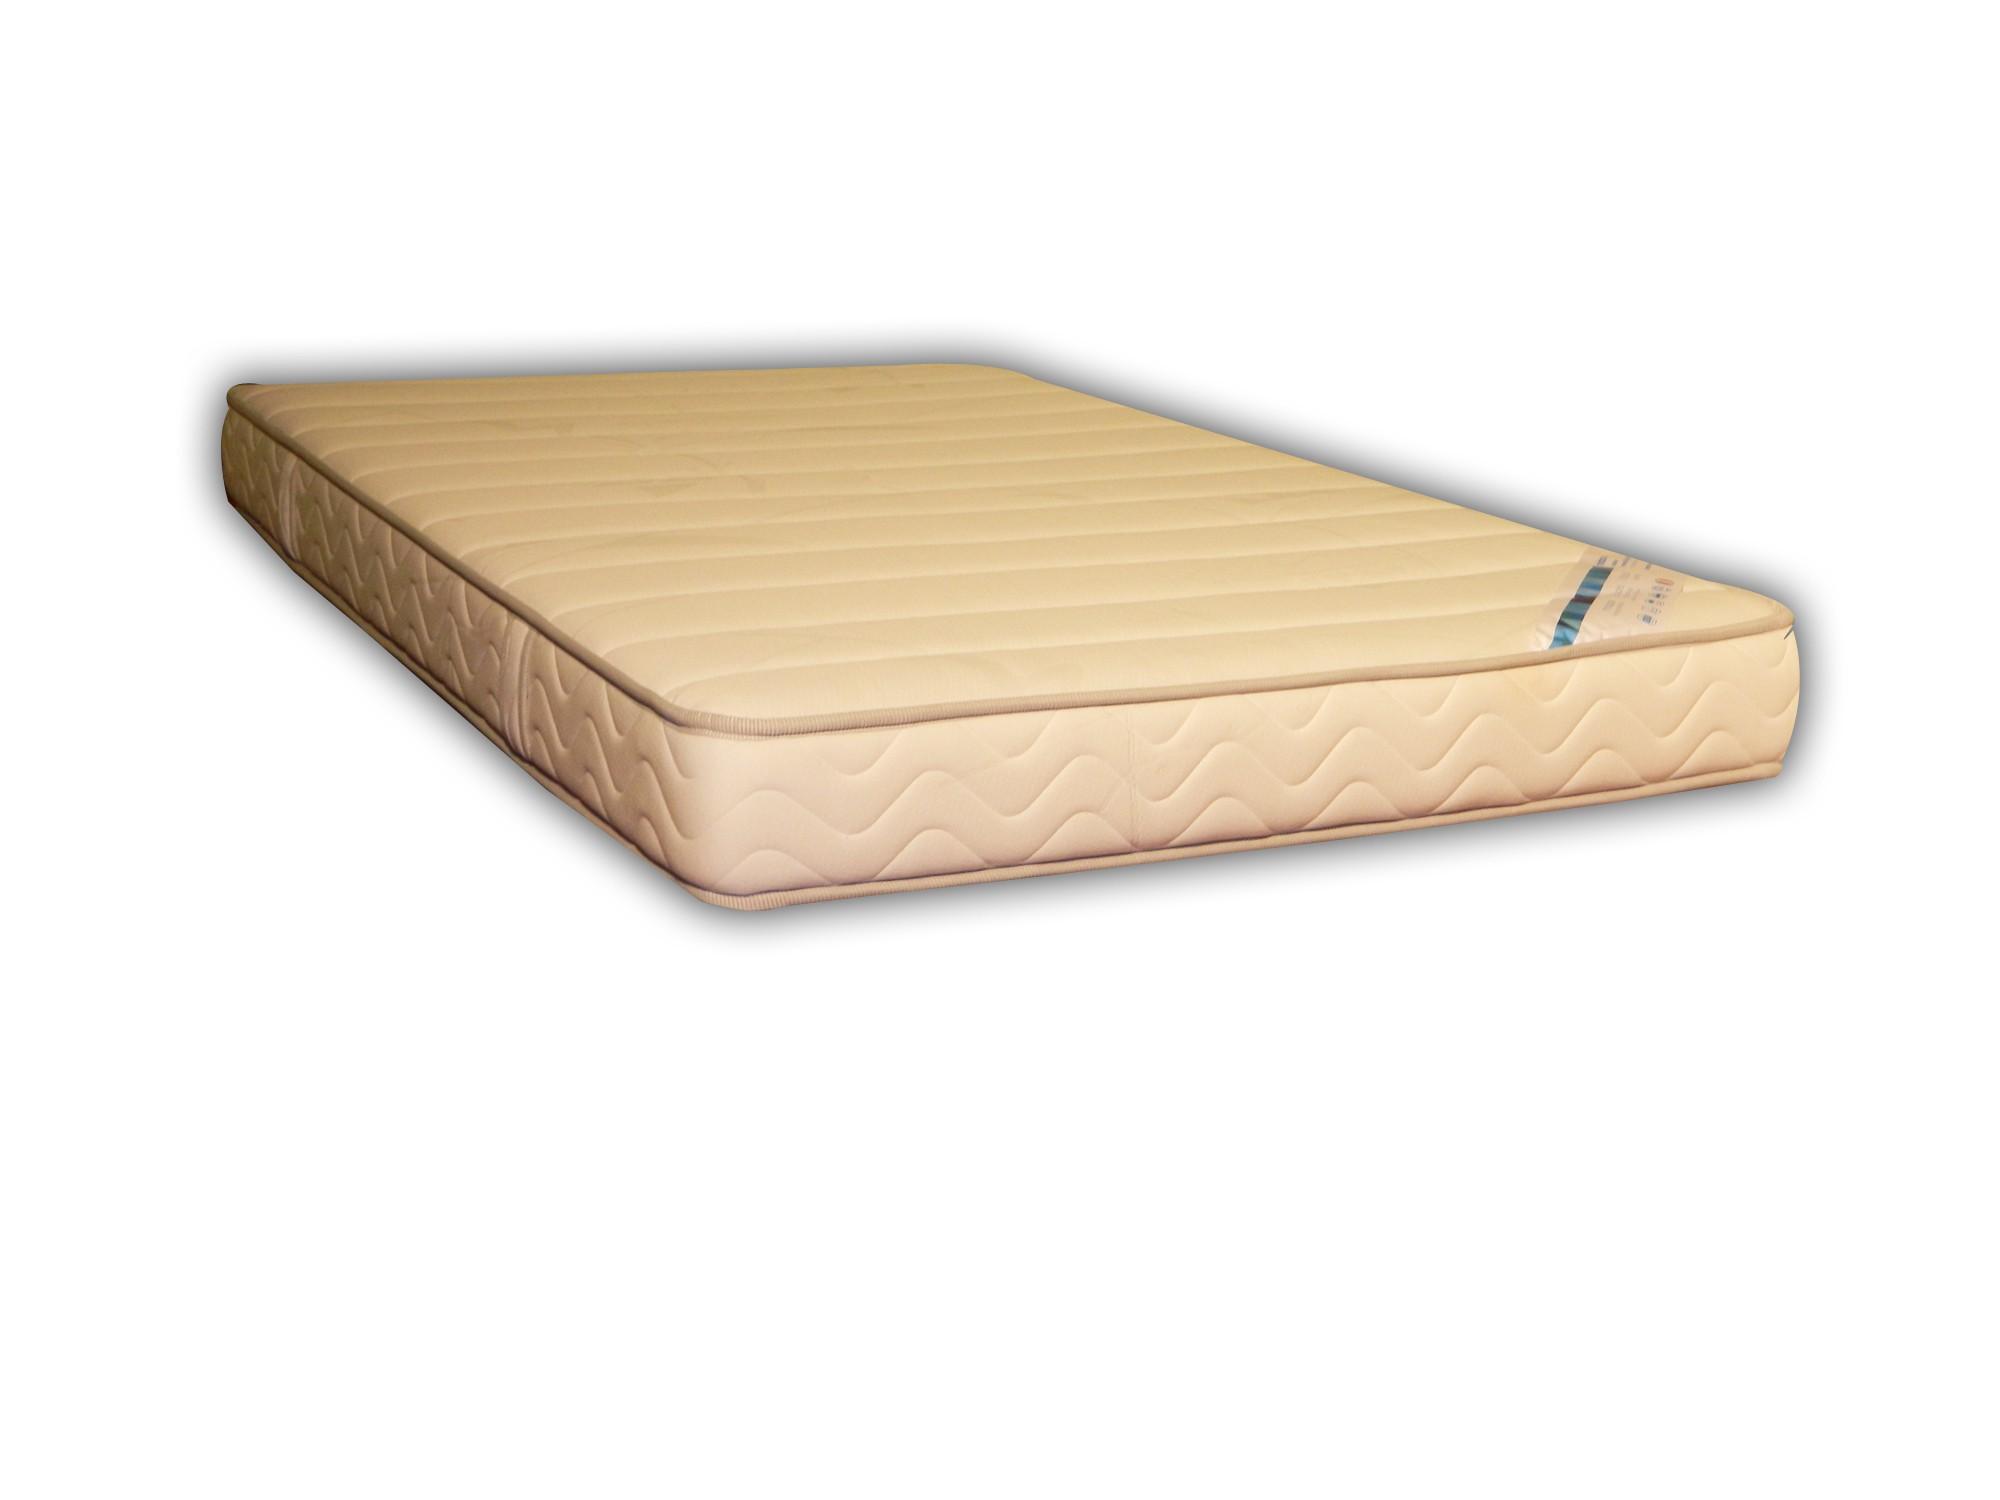 protege matelas 120x190 protege matelas x forme housse arnaud bonnets cm micro respirant with. Black Bedroom Furniture Sets. Home Design Ideas